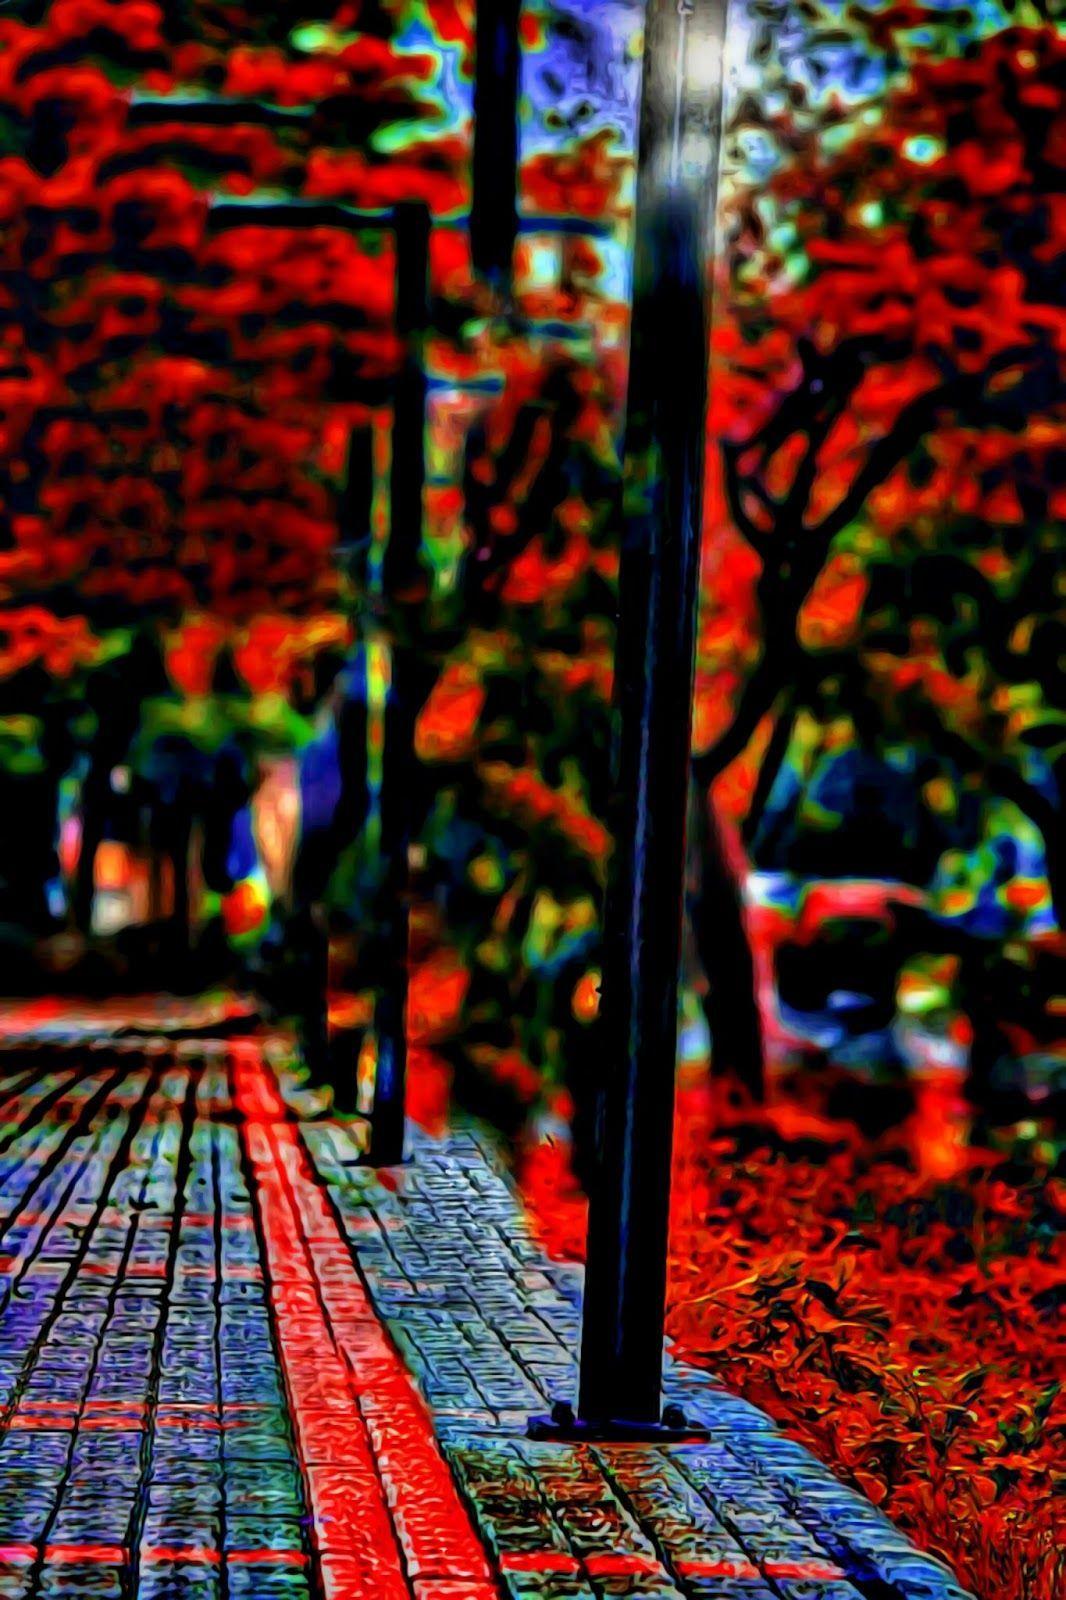 Download Png Background Hd For Picsart Blur Png Gif Base Light Background Images Blur Photo Background Red Background Images Blur light bokeh cb edit background hd